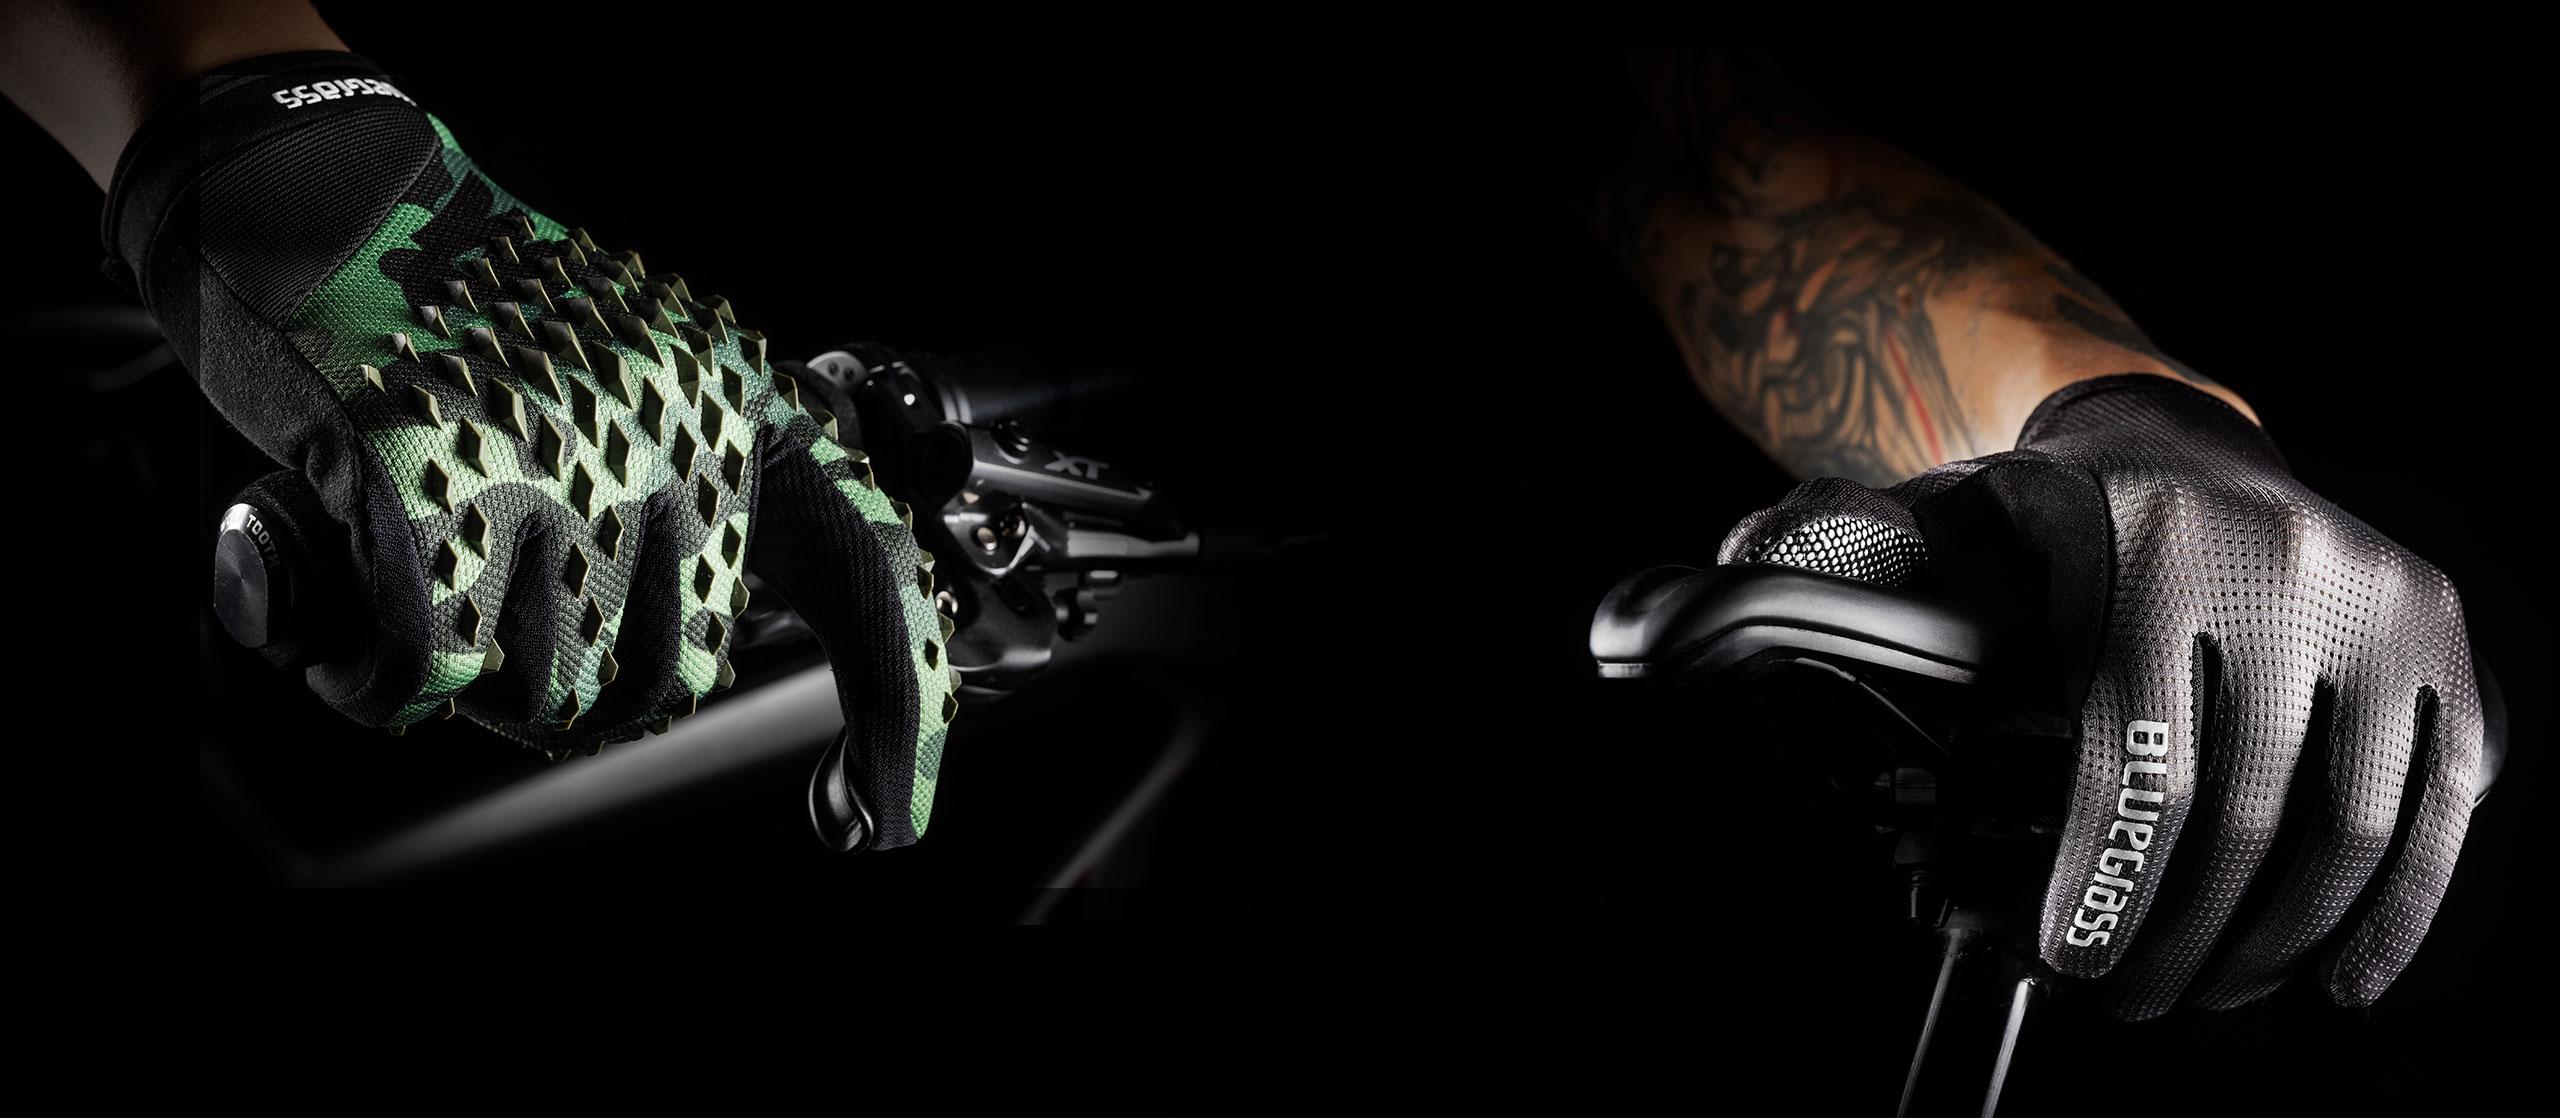 Bluegrass new range of MTB gloves: Vapor Lite, Prizma 3D, Union and React